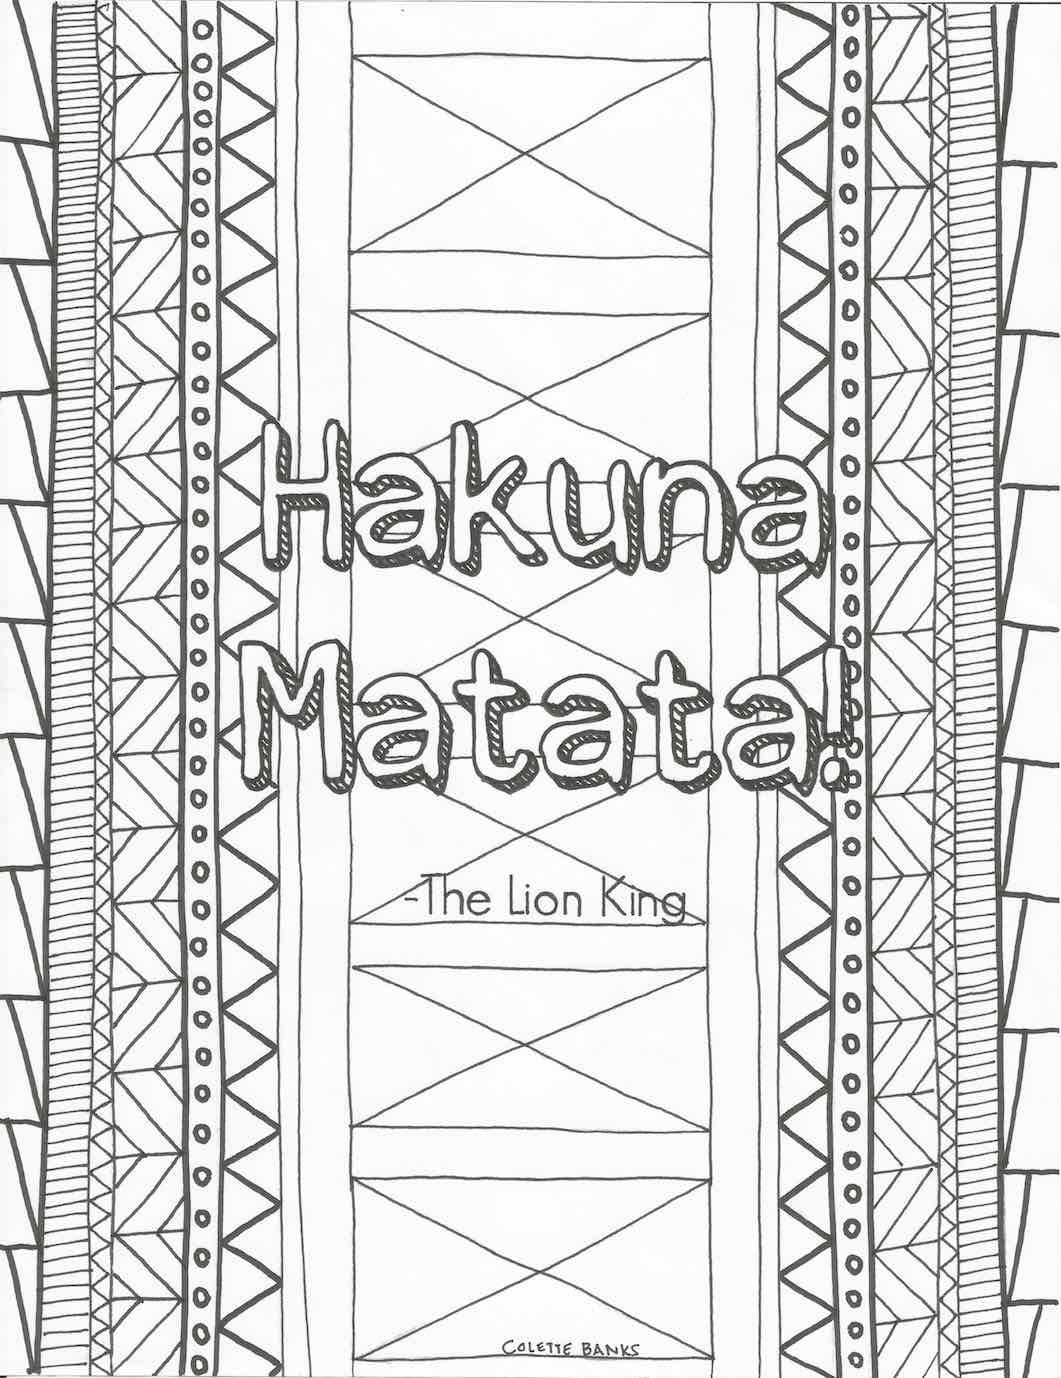 1061x1378 Hakuna Matata Quote Digital Print Adult Coloring Book Page